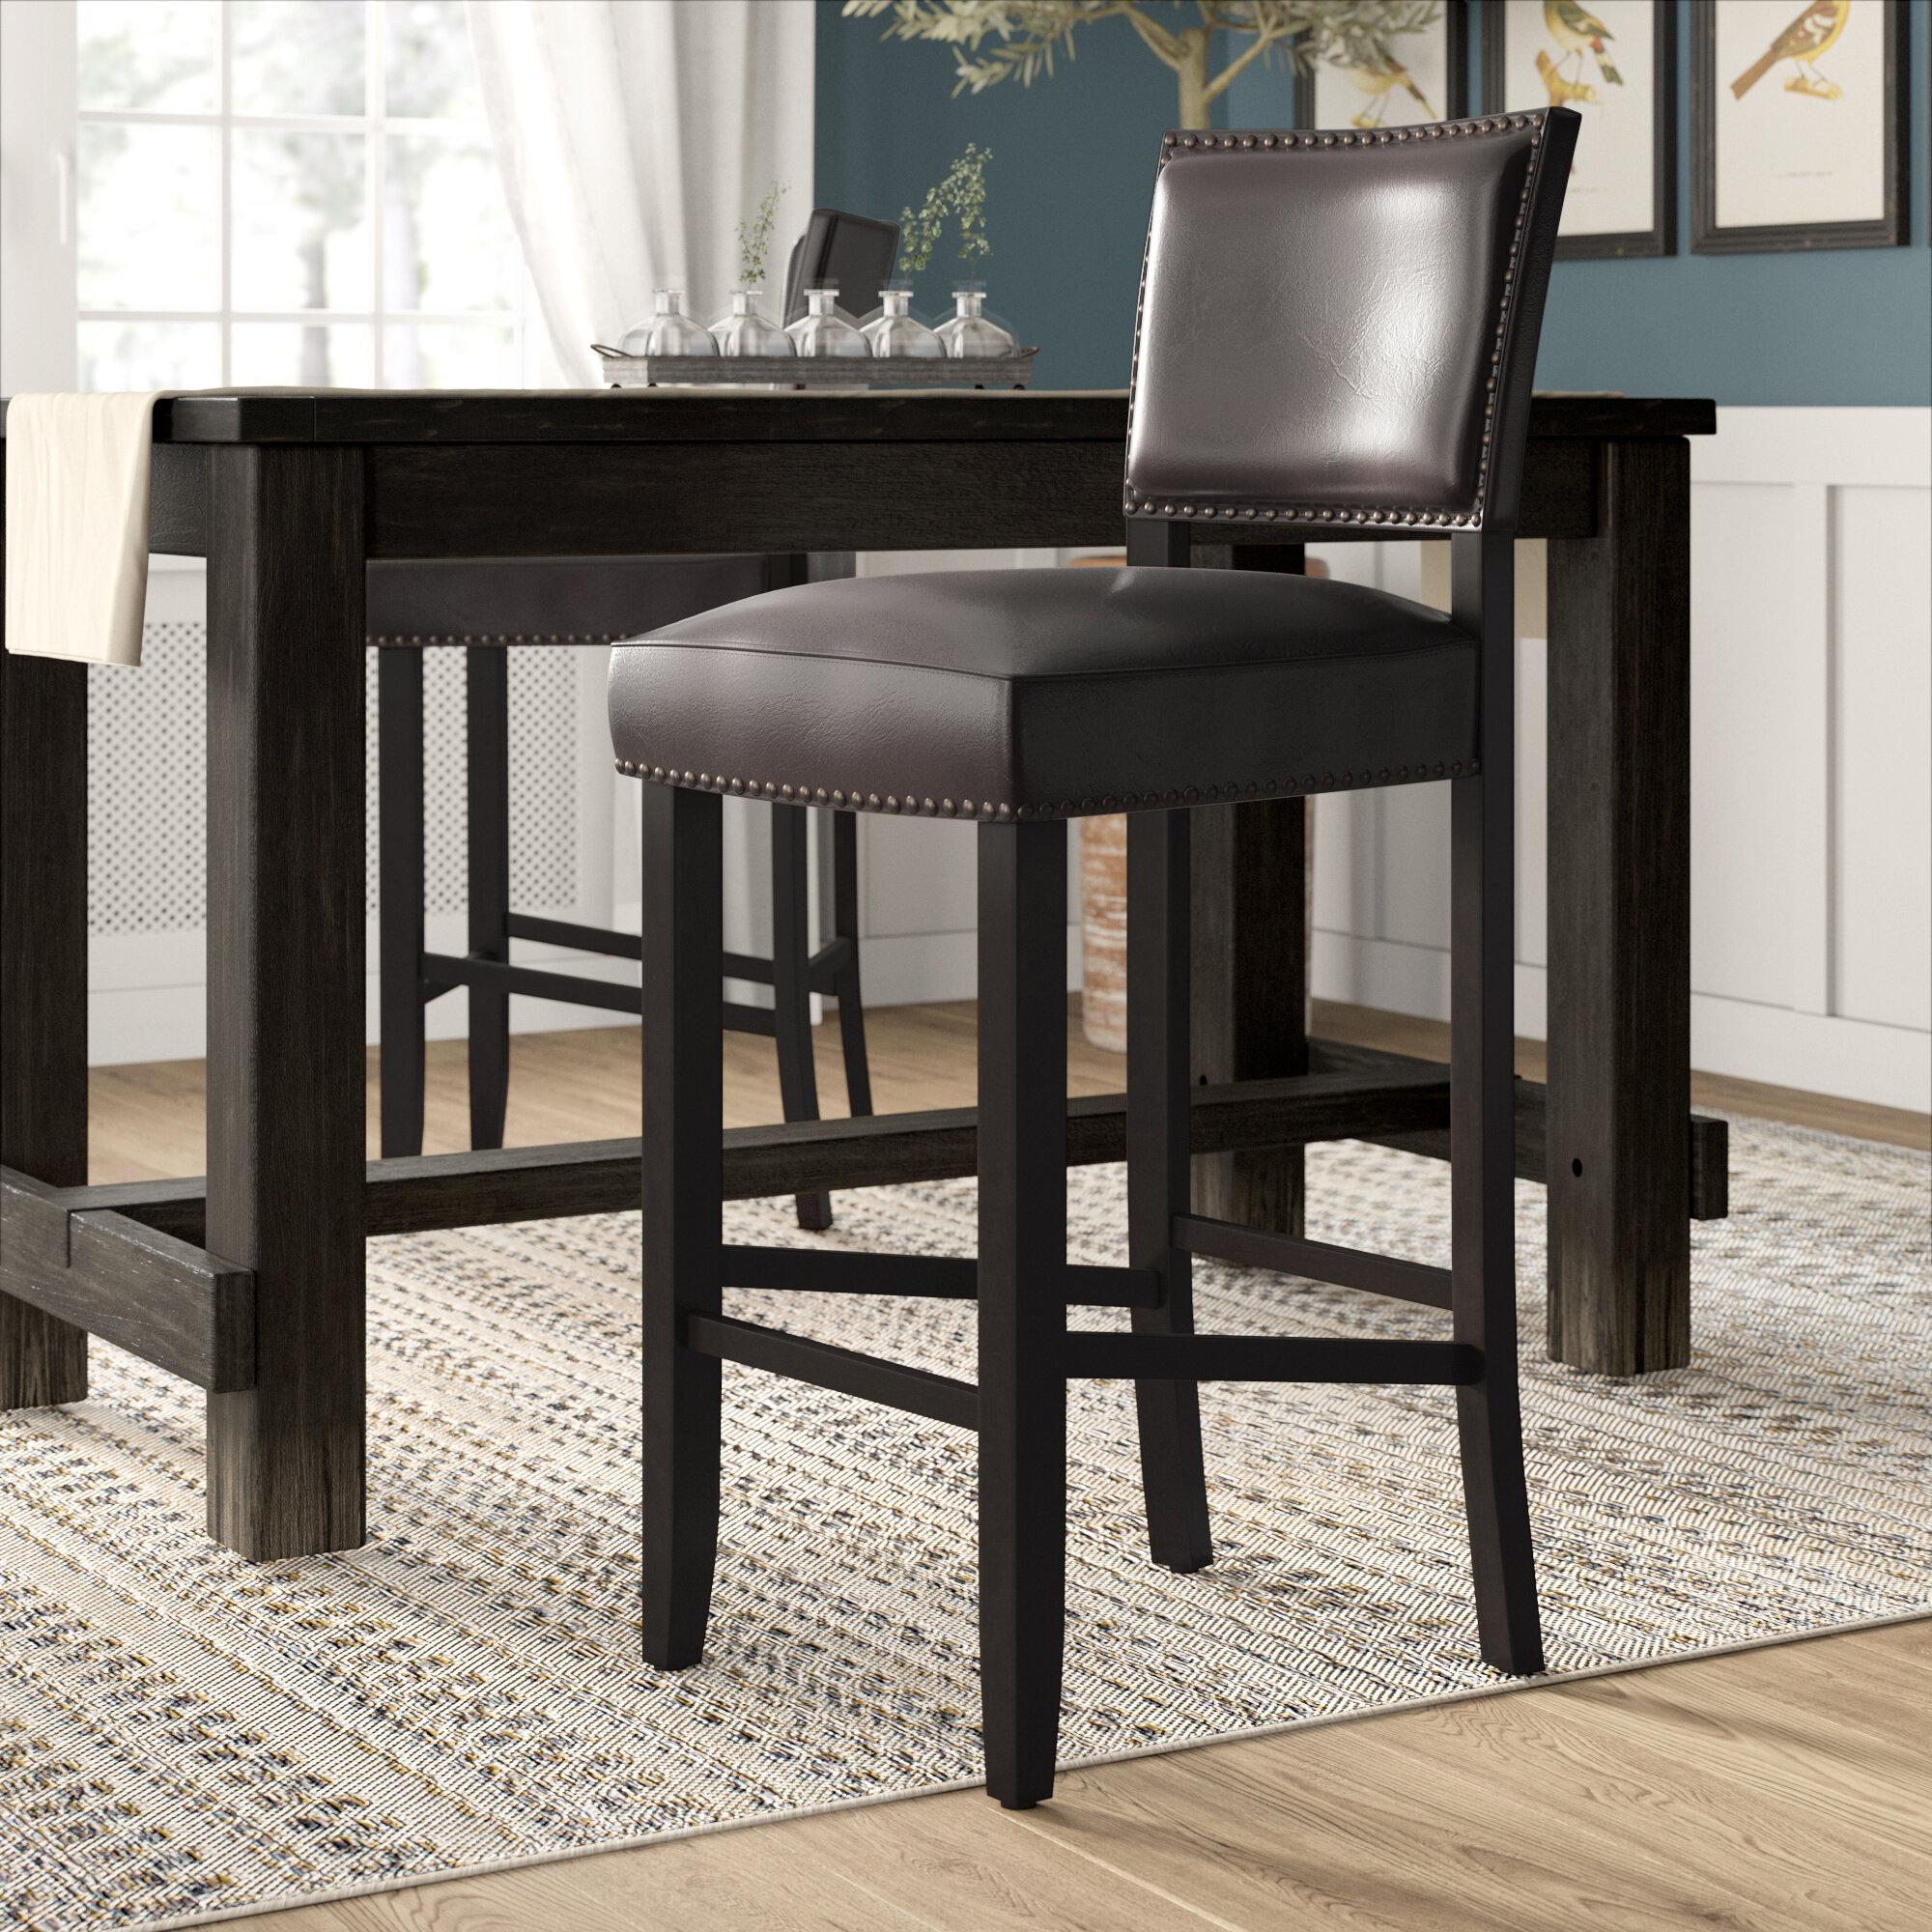 Awe Inspiring Calgary 30 5 Bar Stool Machost Co Dining Chair Design Ideas Machostcouk